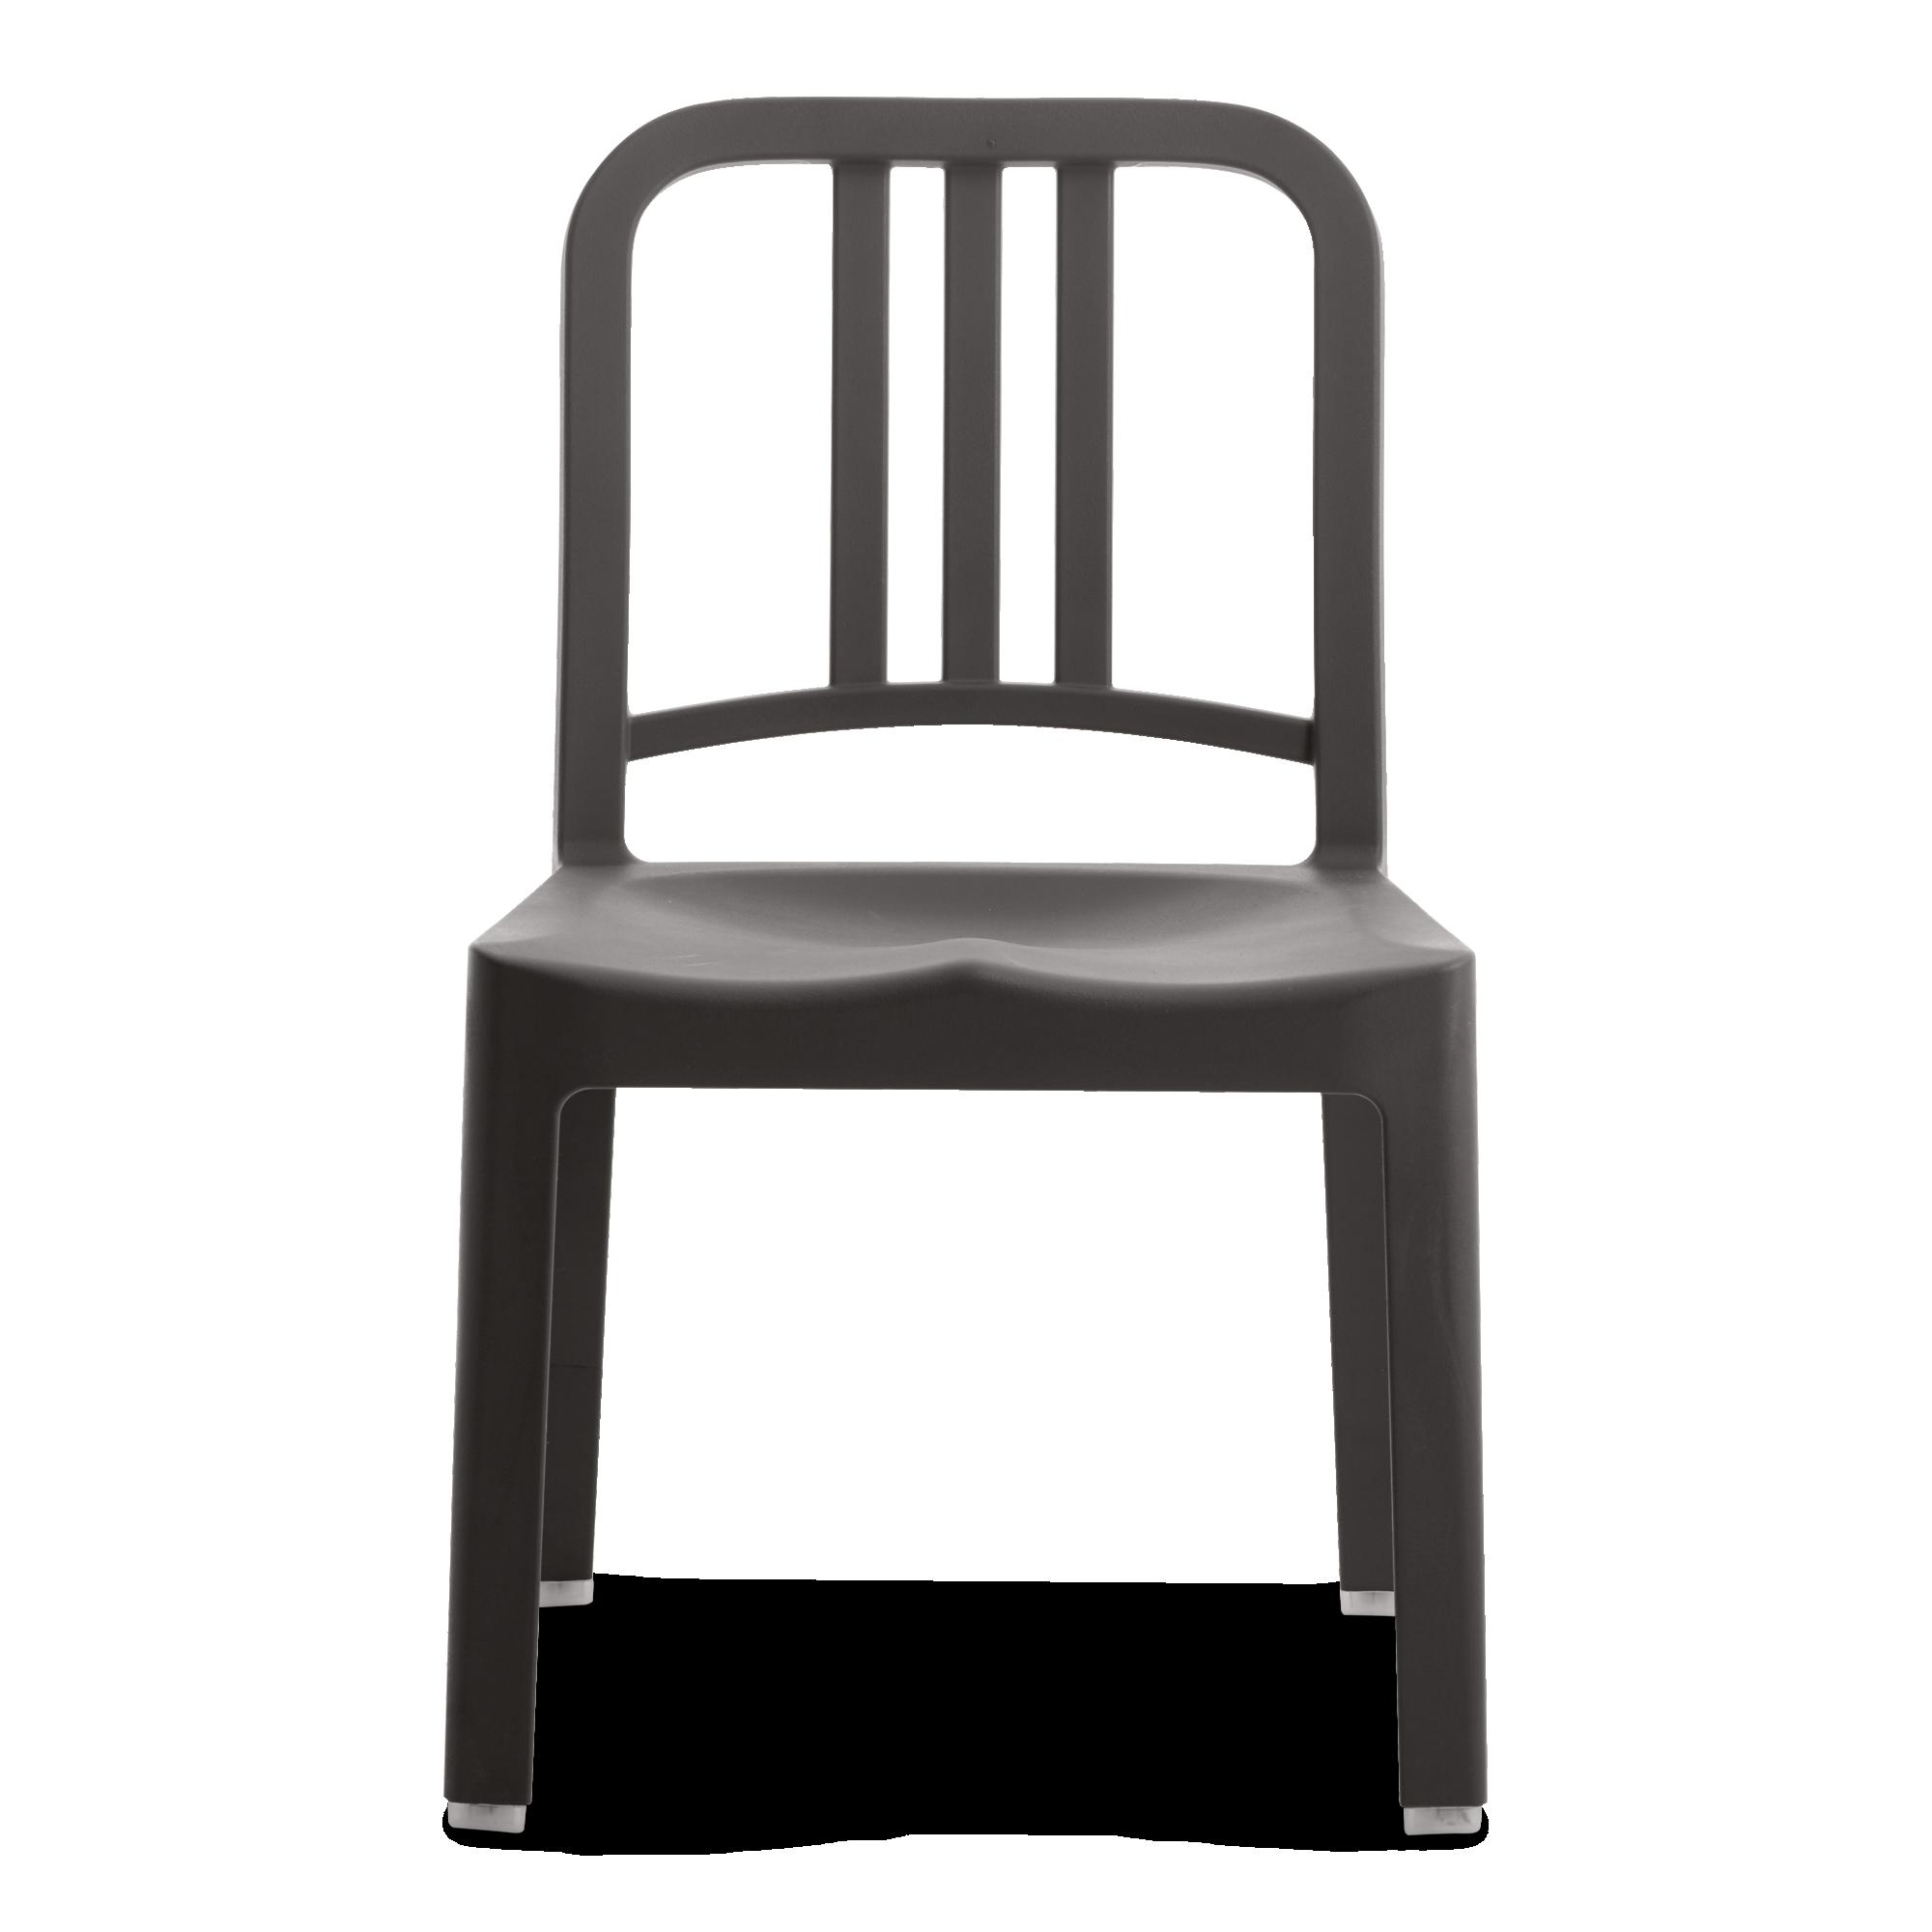 111-navy-mini-chair-charcoal